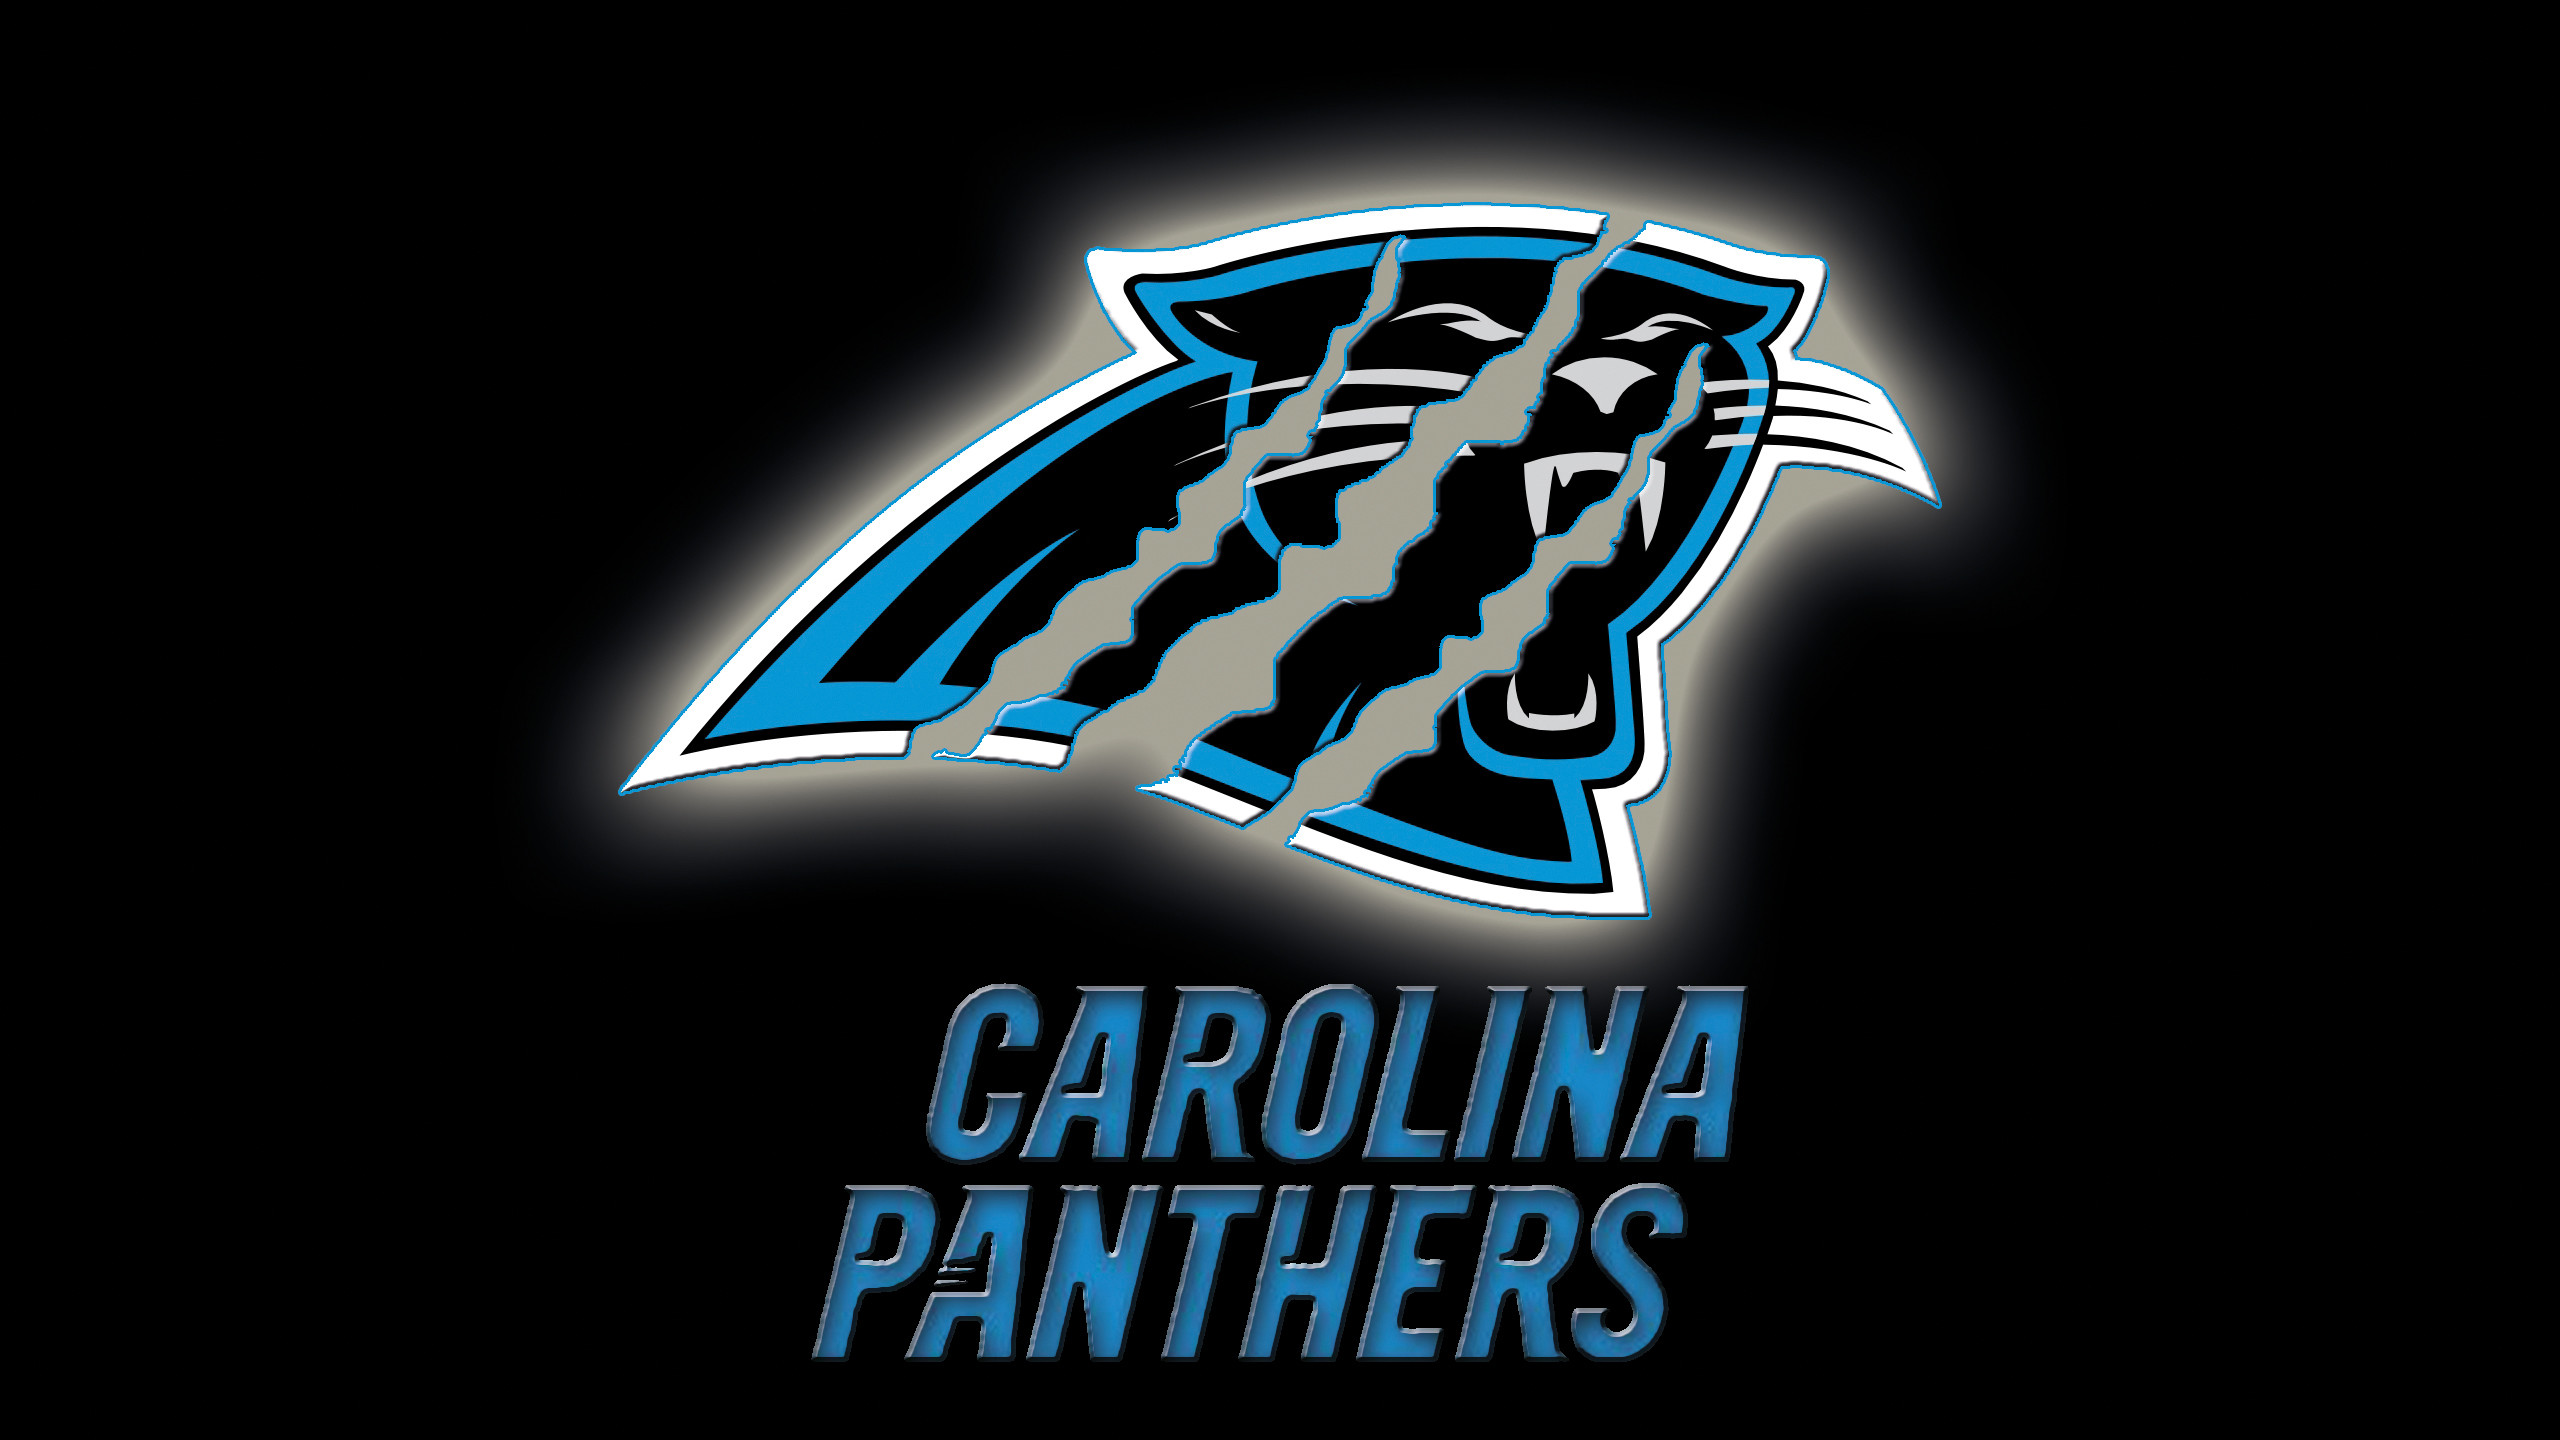 Carolina Panthers by BeAware8 Carolina Panthers by BeAware8 by .